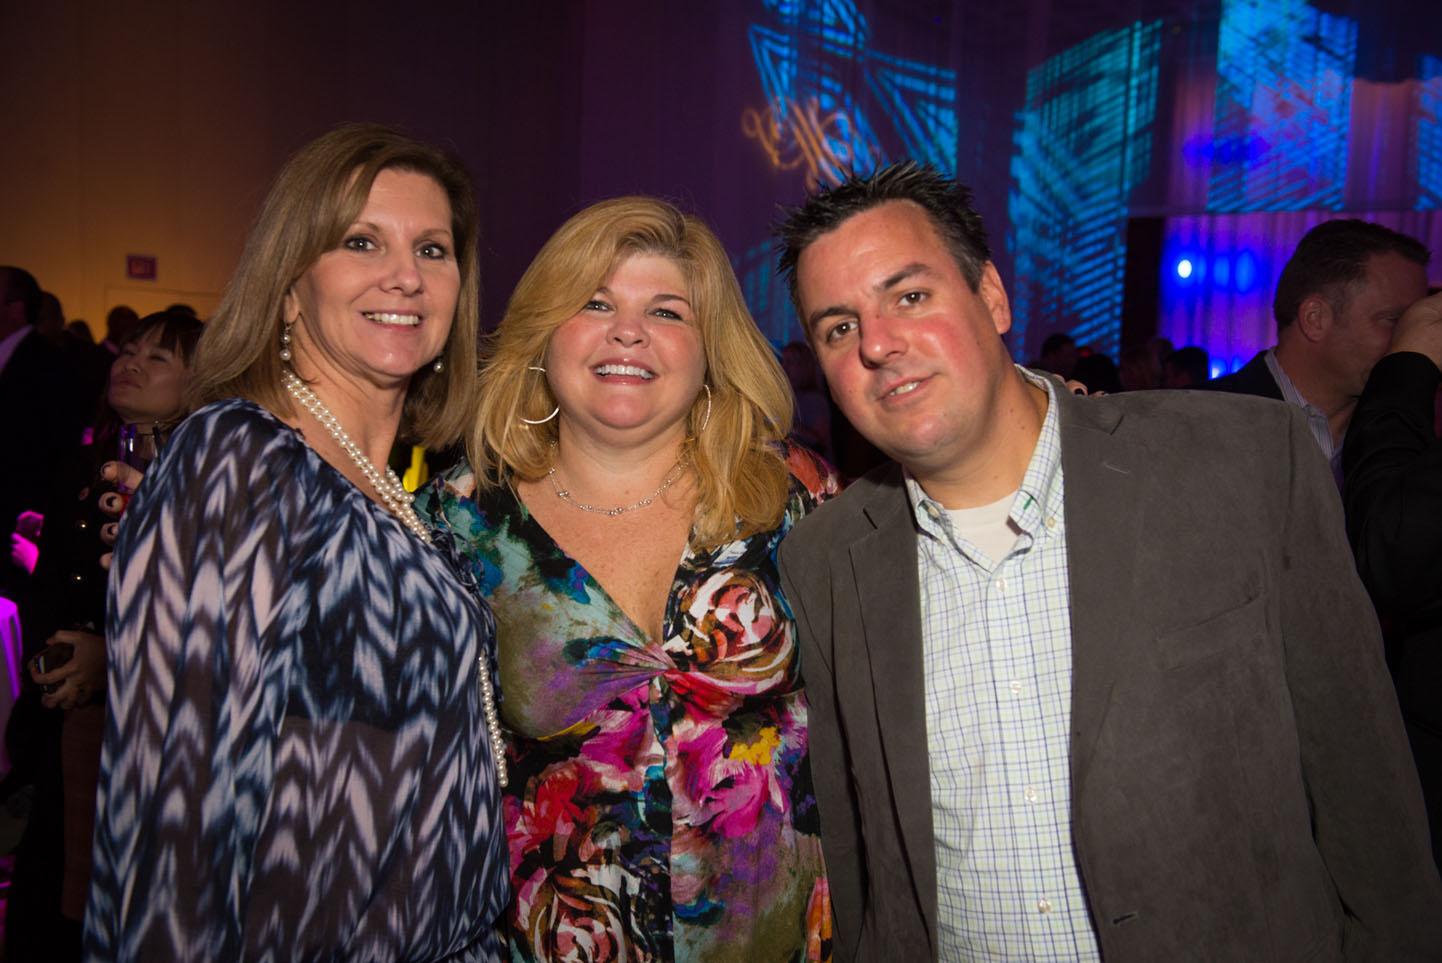 2015-12-09 ReMax Corpoarte Event - The Borgata - Atlantic City NJ - Photo Sesh - 2015-5257.jpg